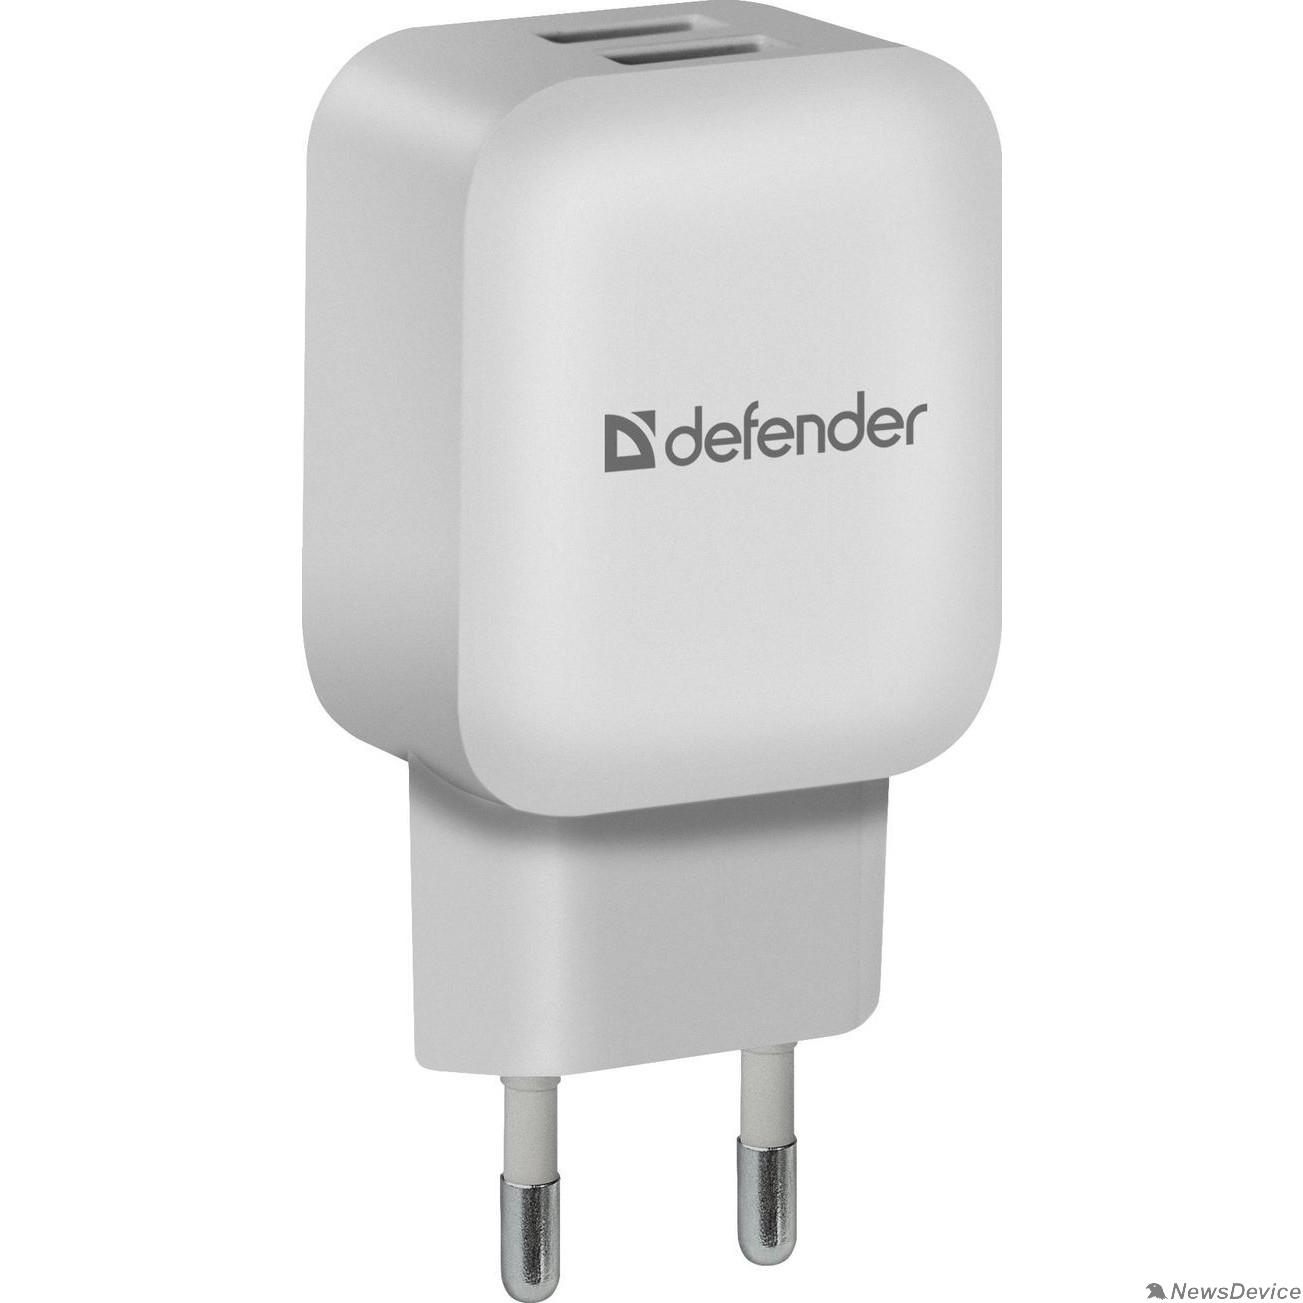 Аксессуар Defender Сетевой адаптер 2xUSB, 5V/2.1А, белый, пакет (EPA-13) (83841)